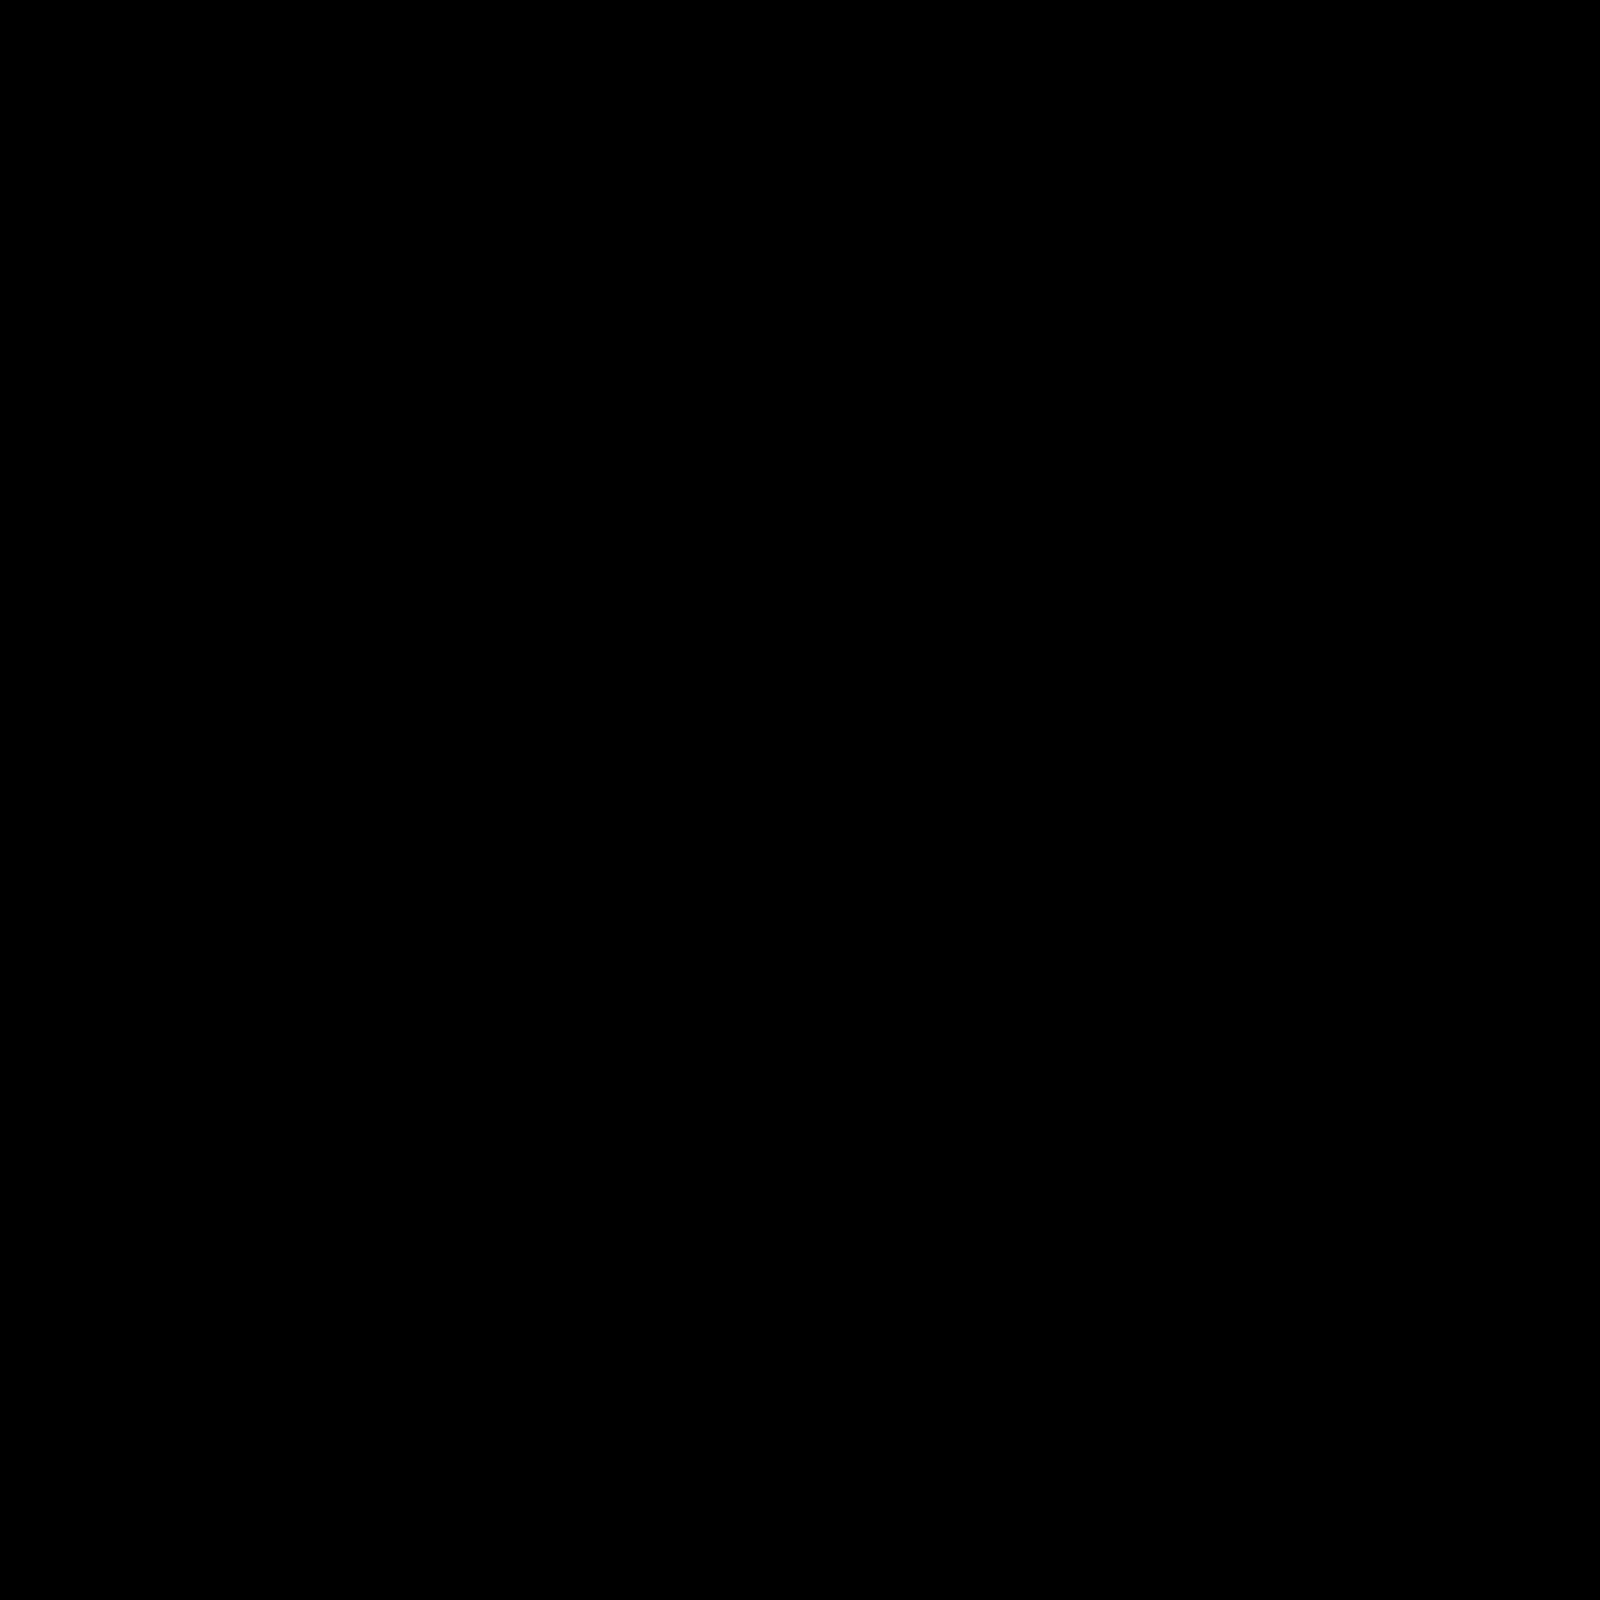 Izrael Mosad icon